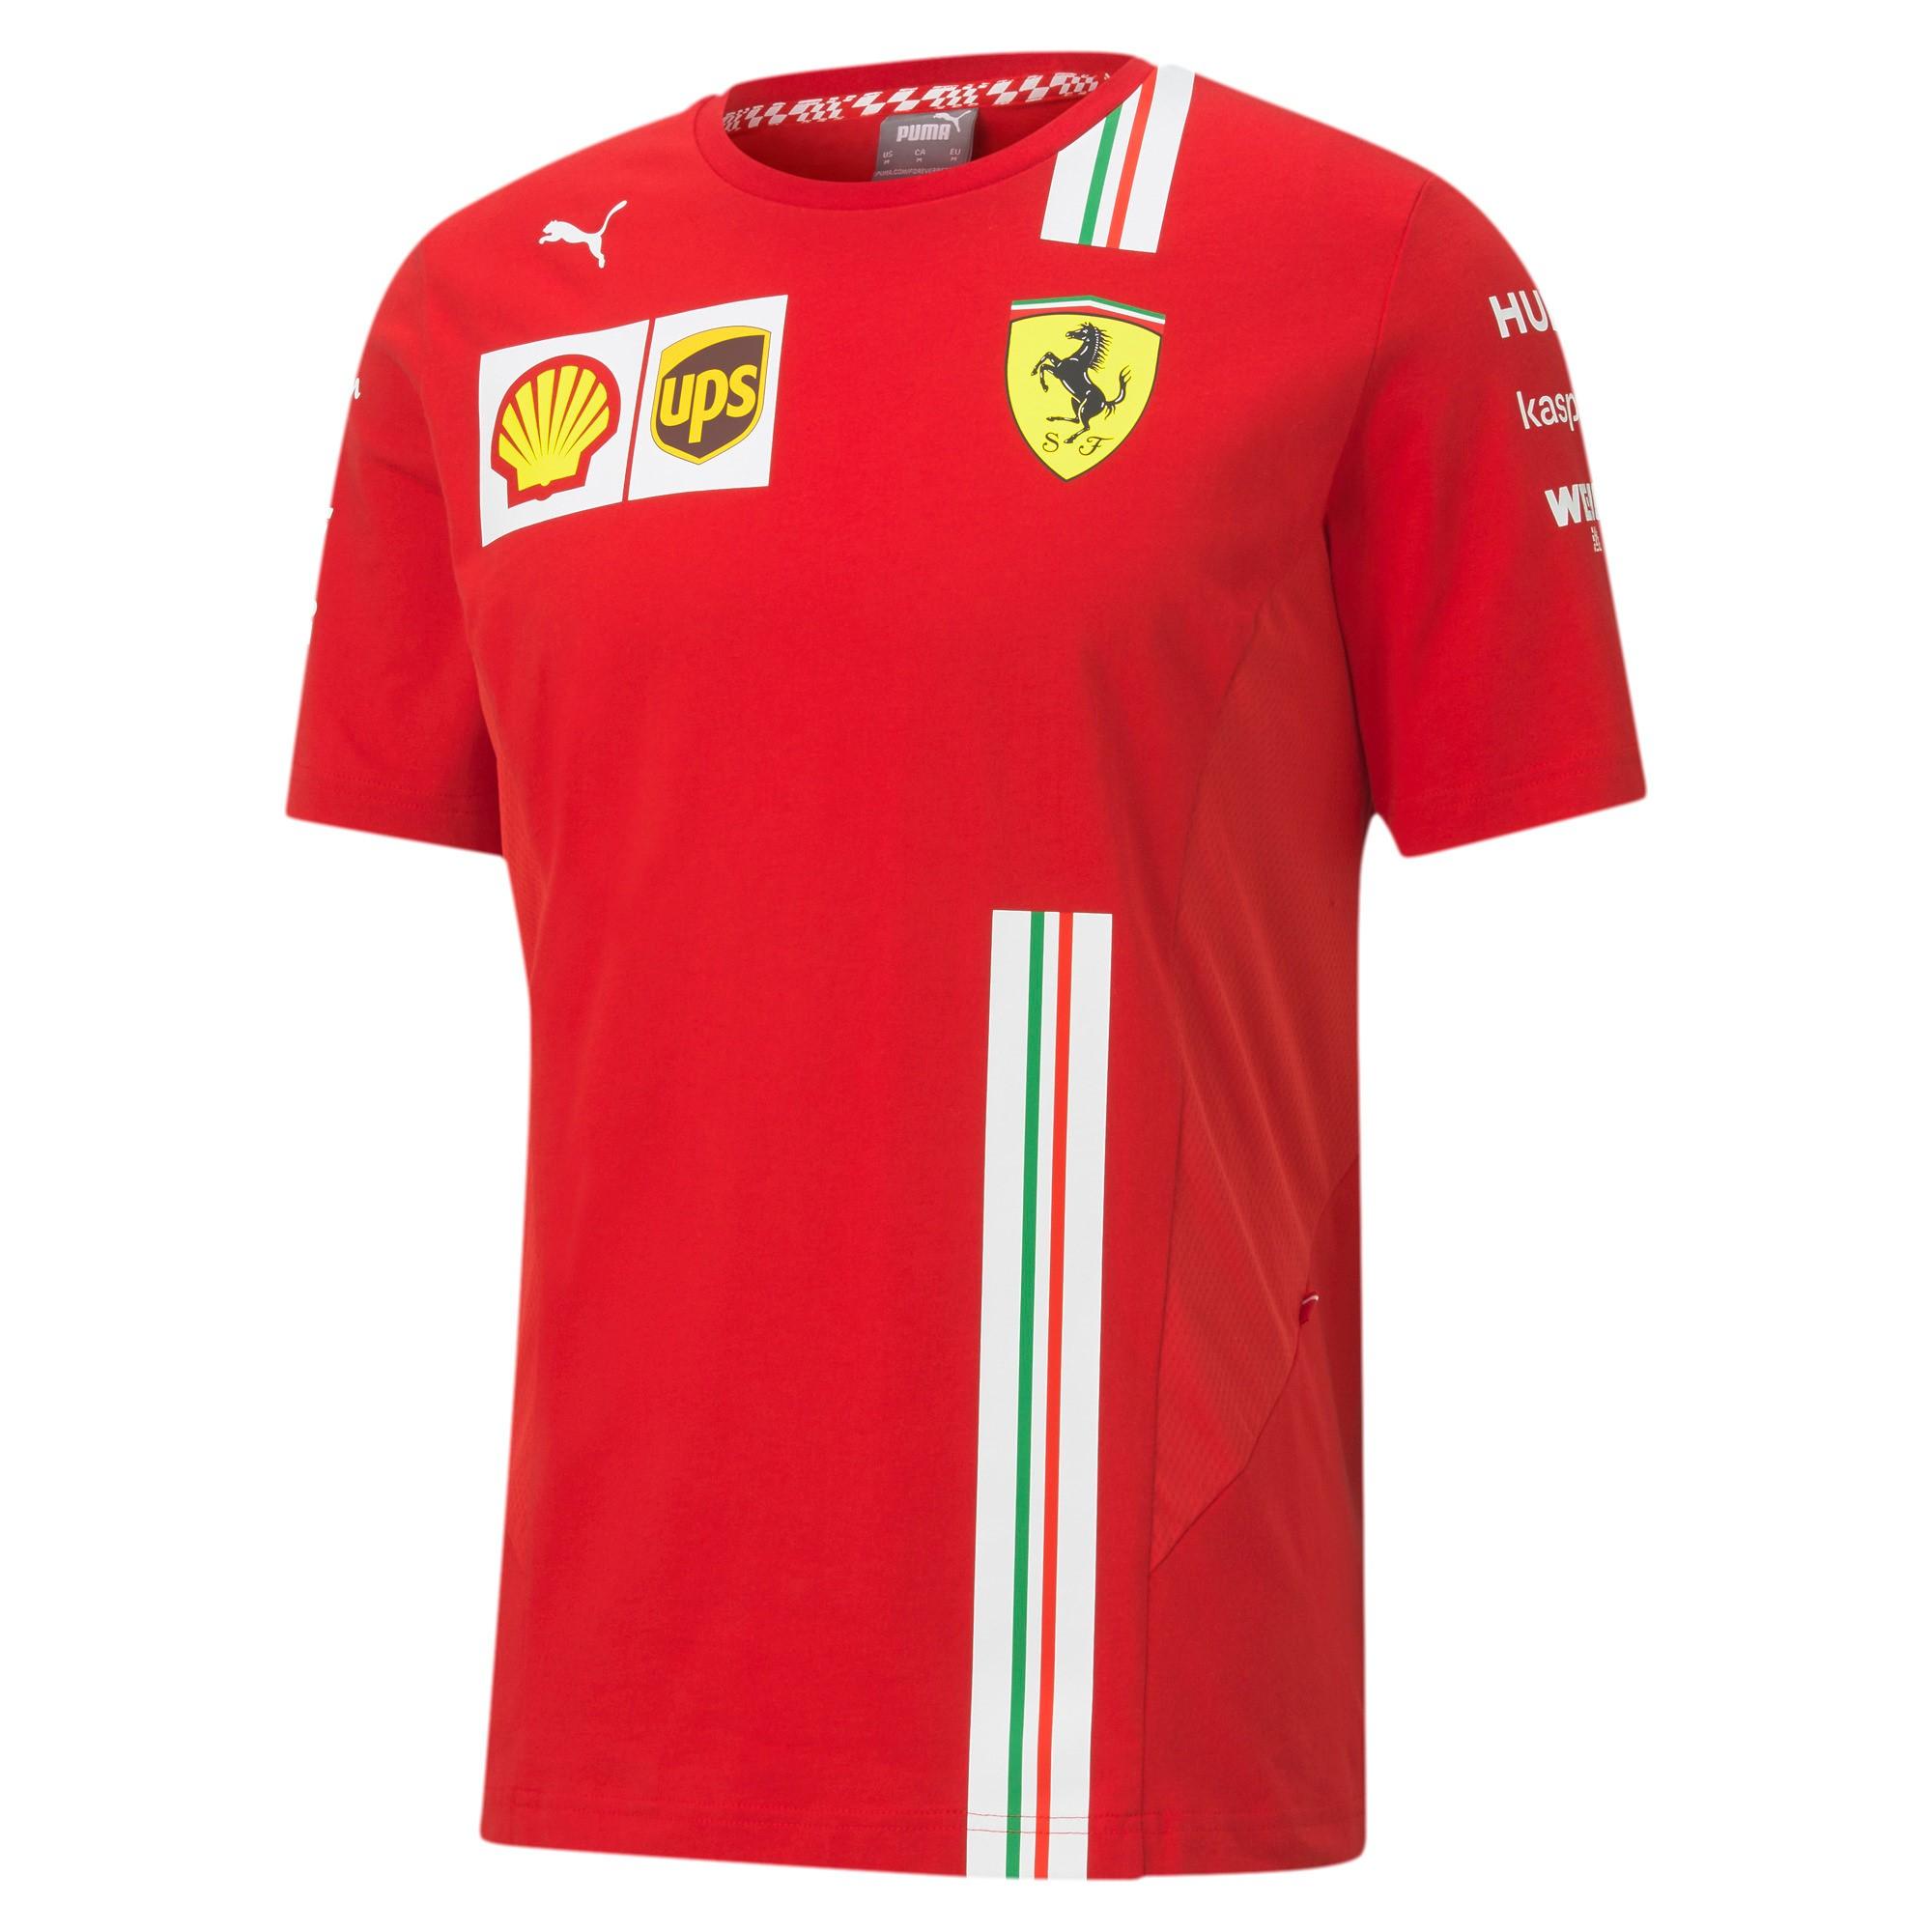 Scuderia Ferrari Team Tee Kid